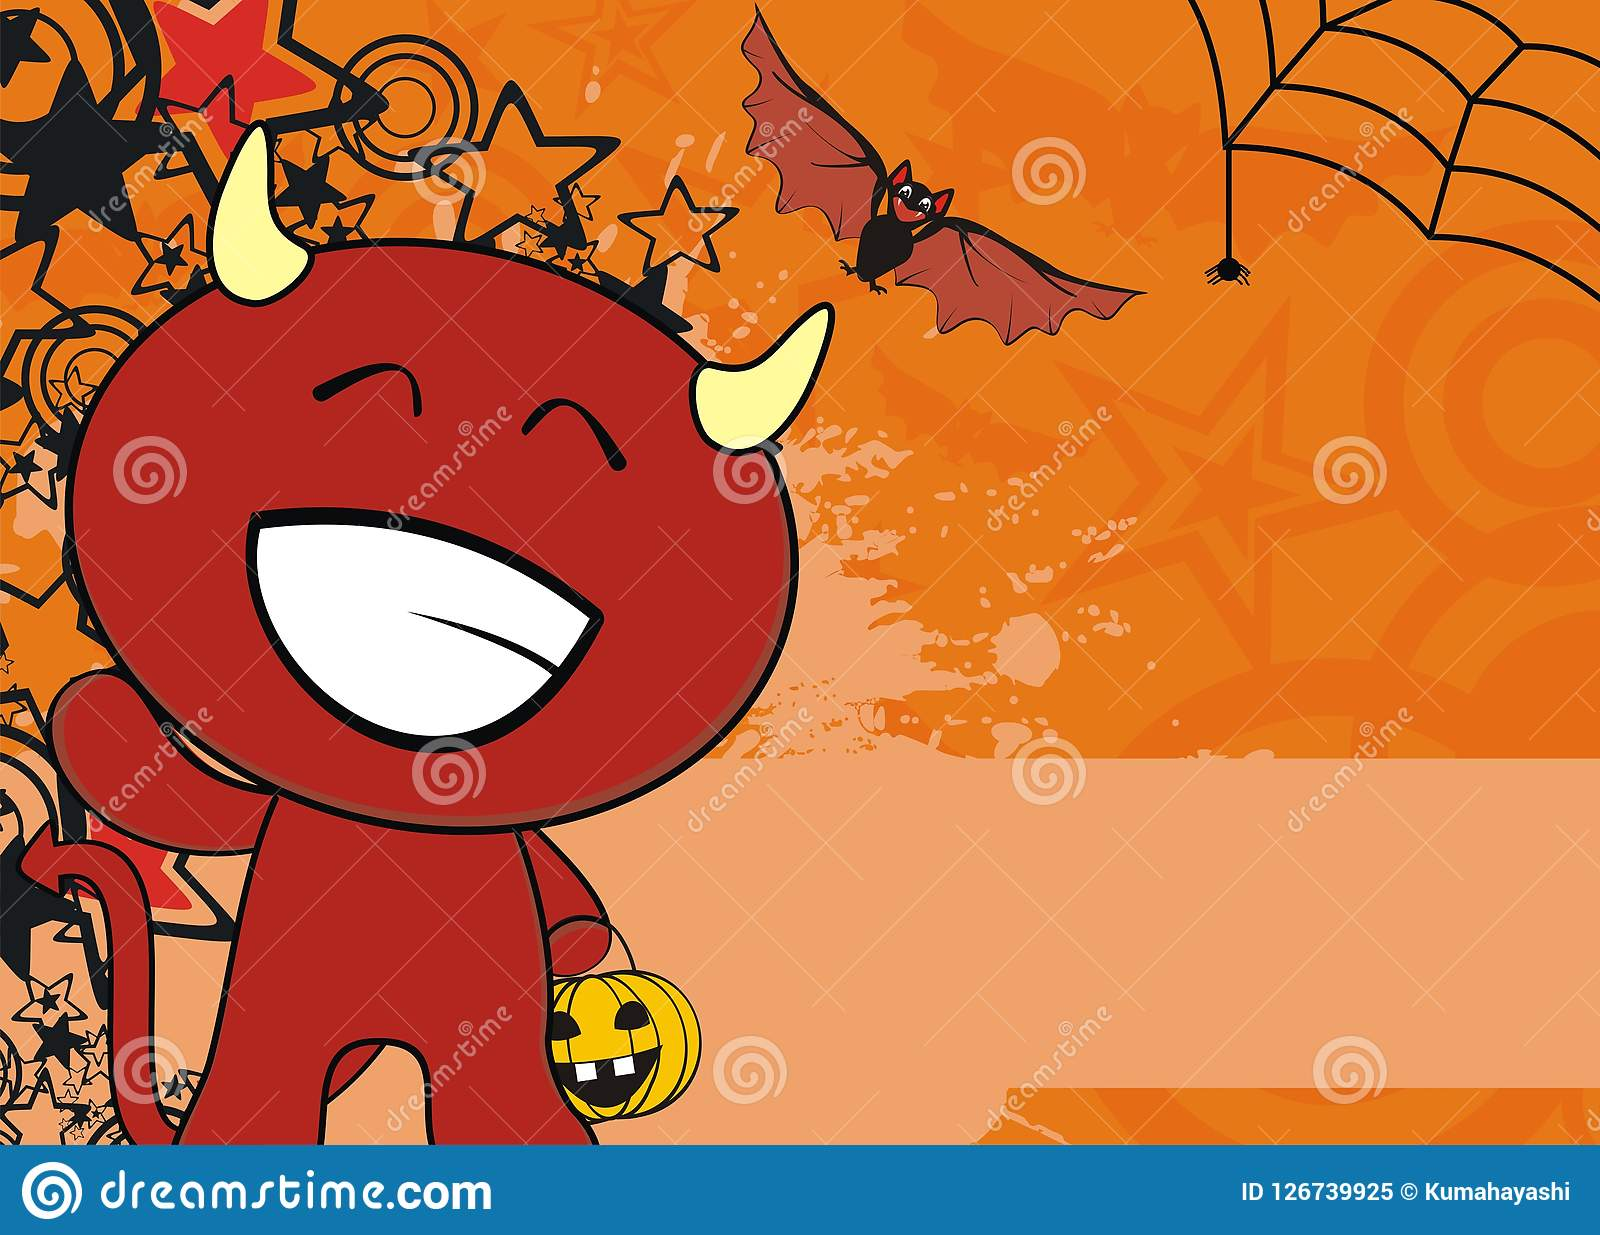 Cute Red Demon Cartoon Halloween Background2 Stock Vector